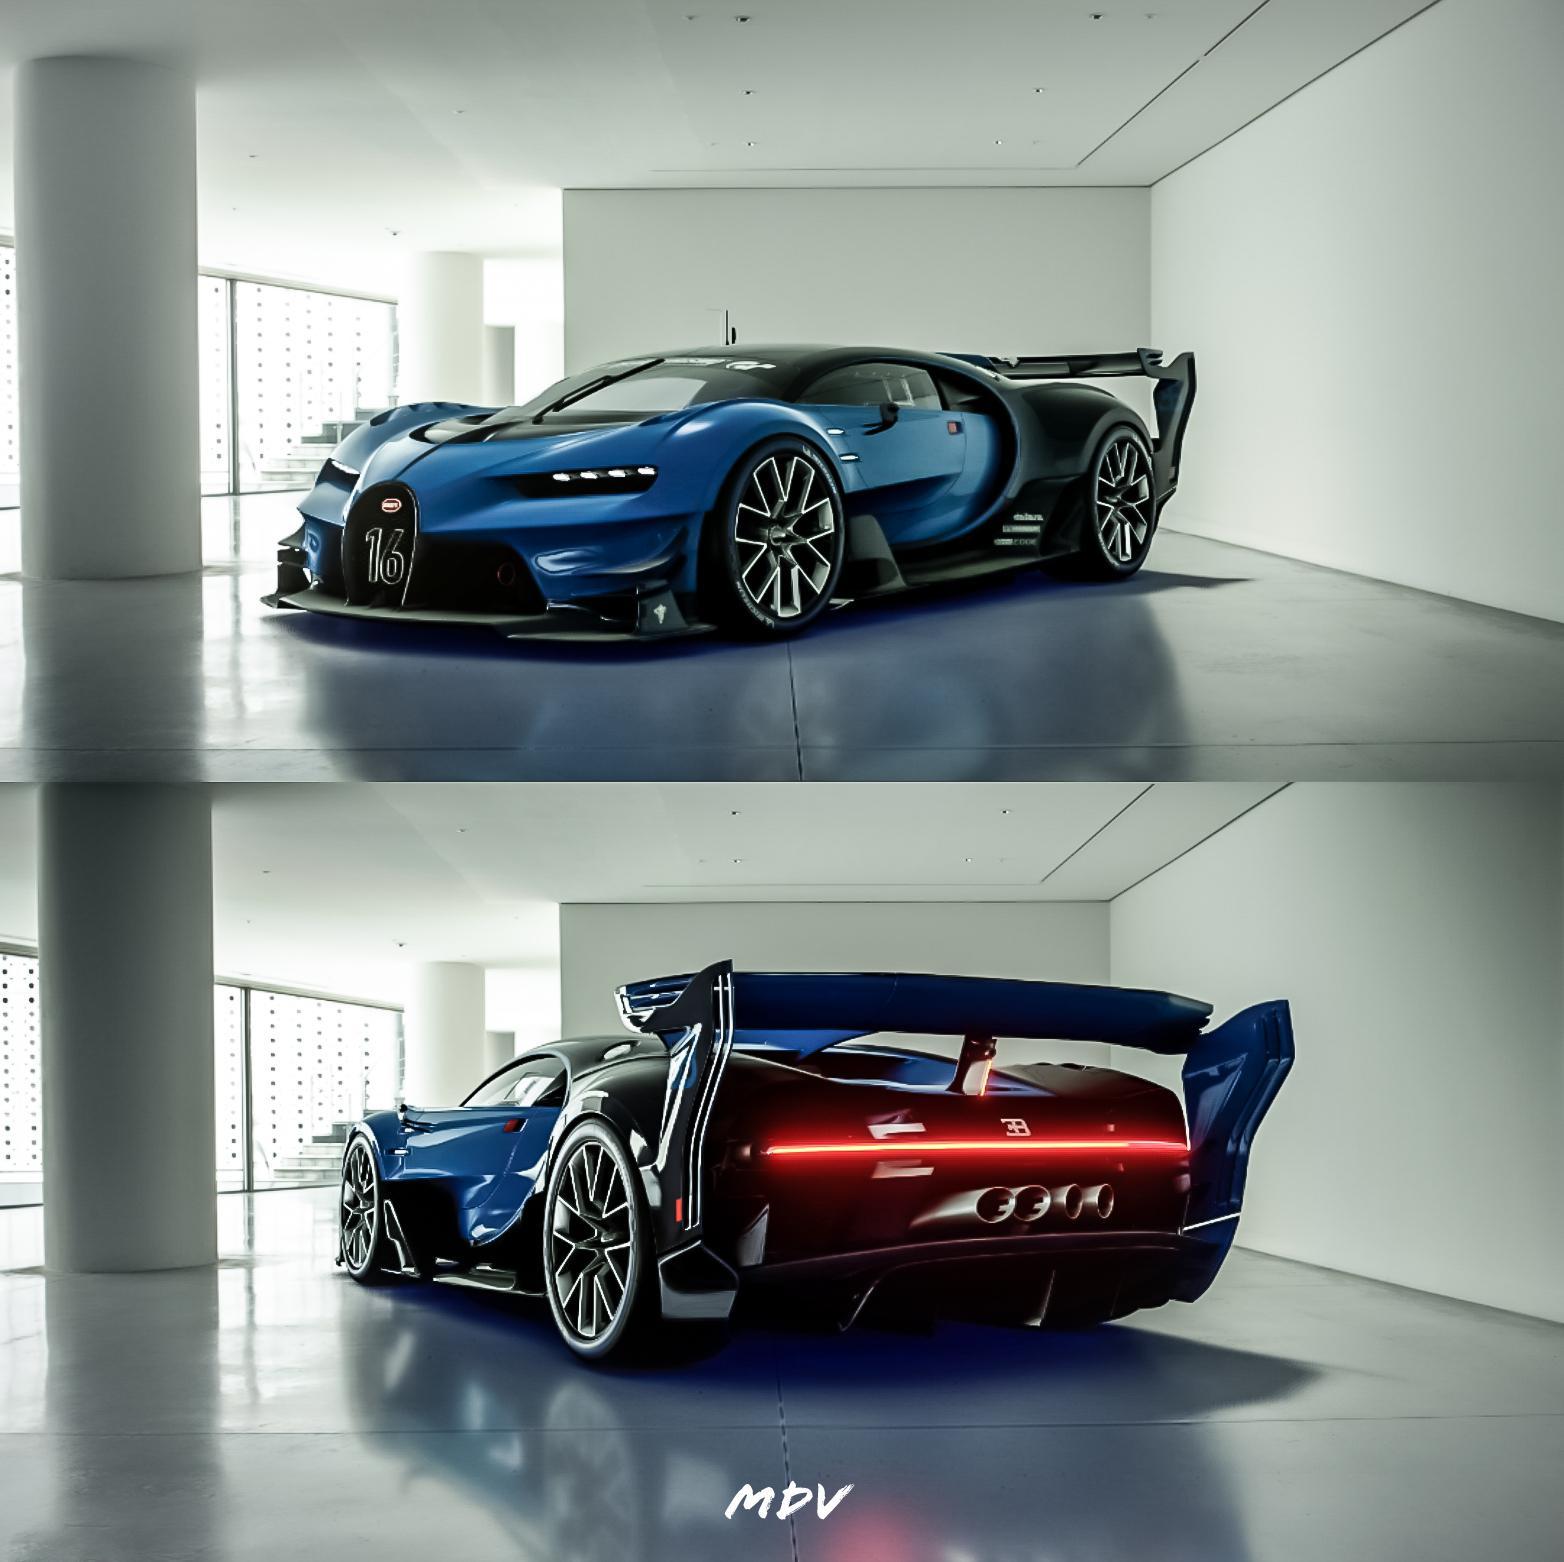 Bugatti VGT in a Japanese Museum